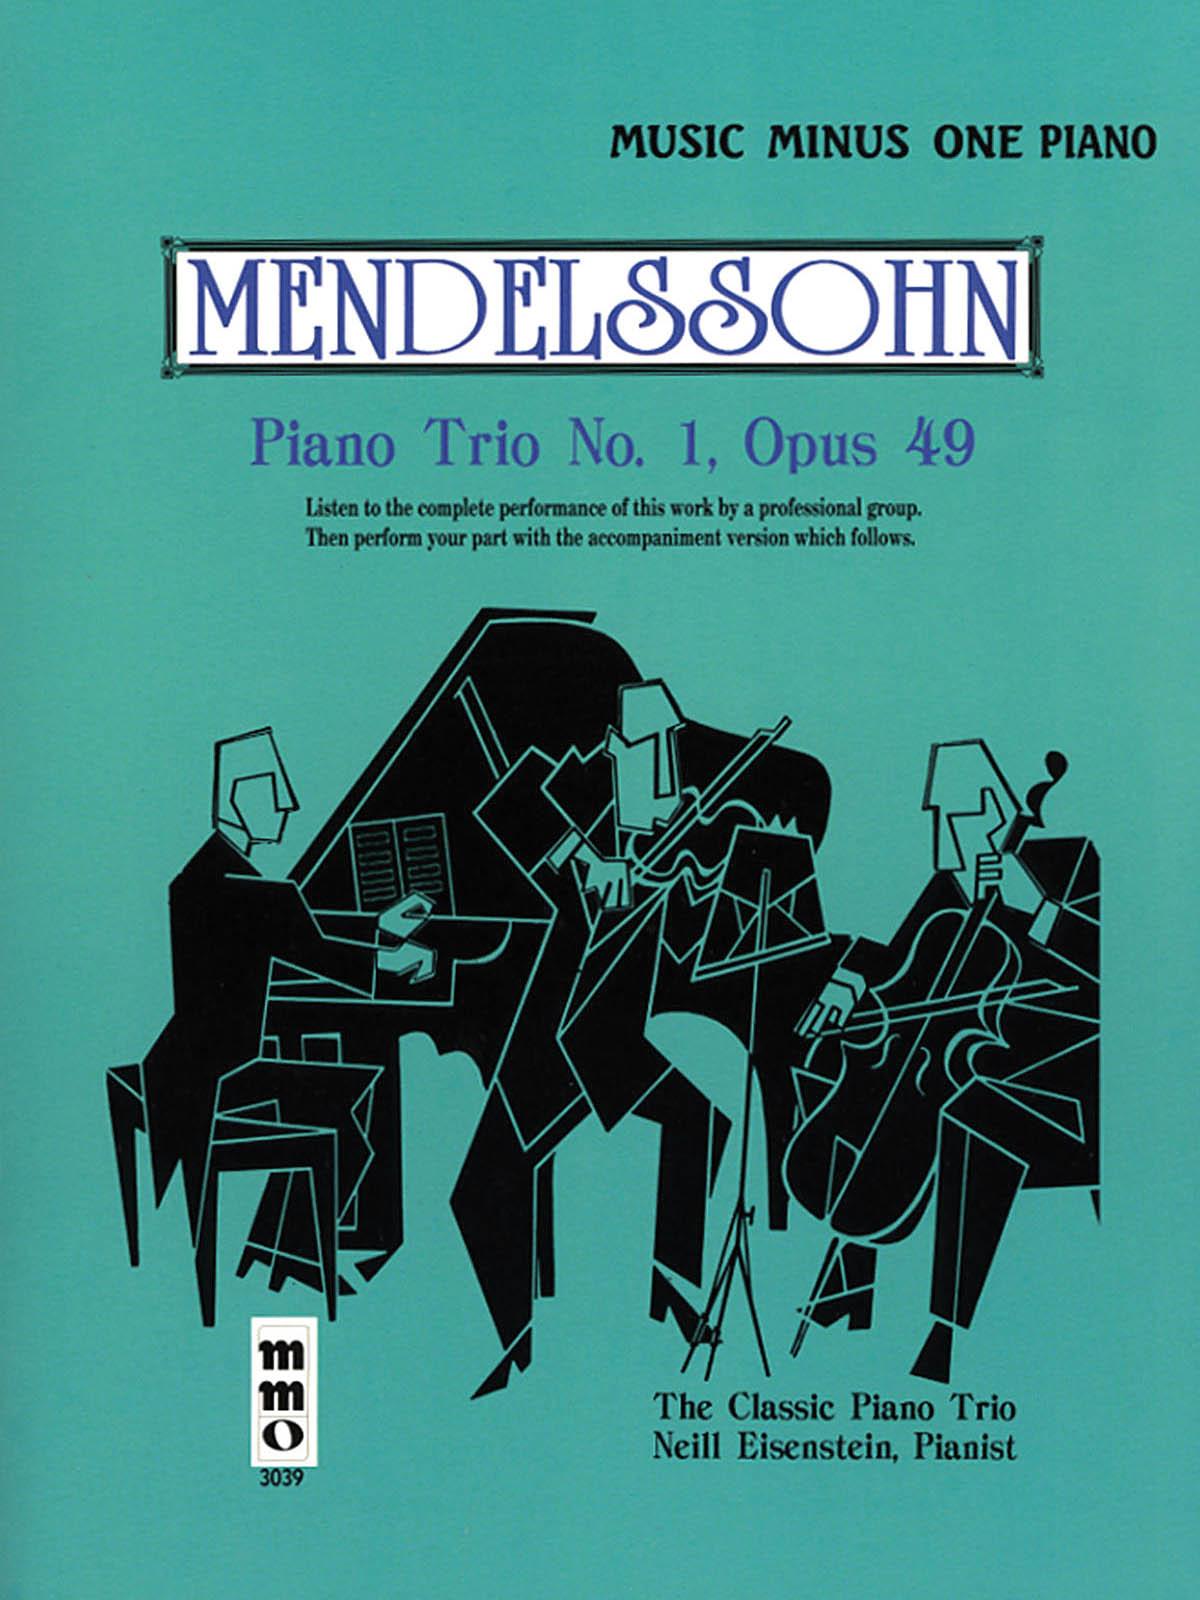 Felix Mendelssohn Bartholdy: Mendelssohn - Piano Trio No. 1 in D Major  Op. 49: